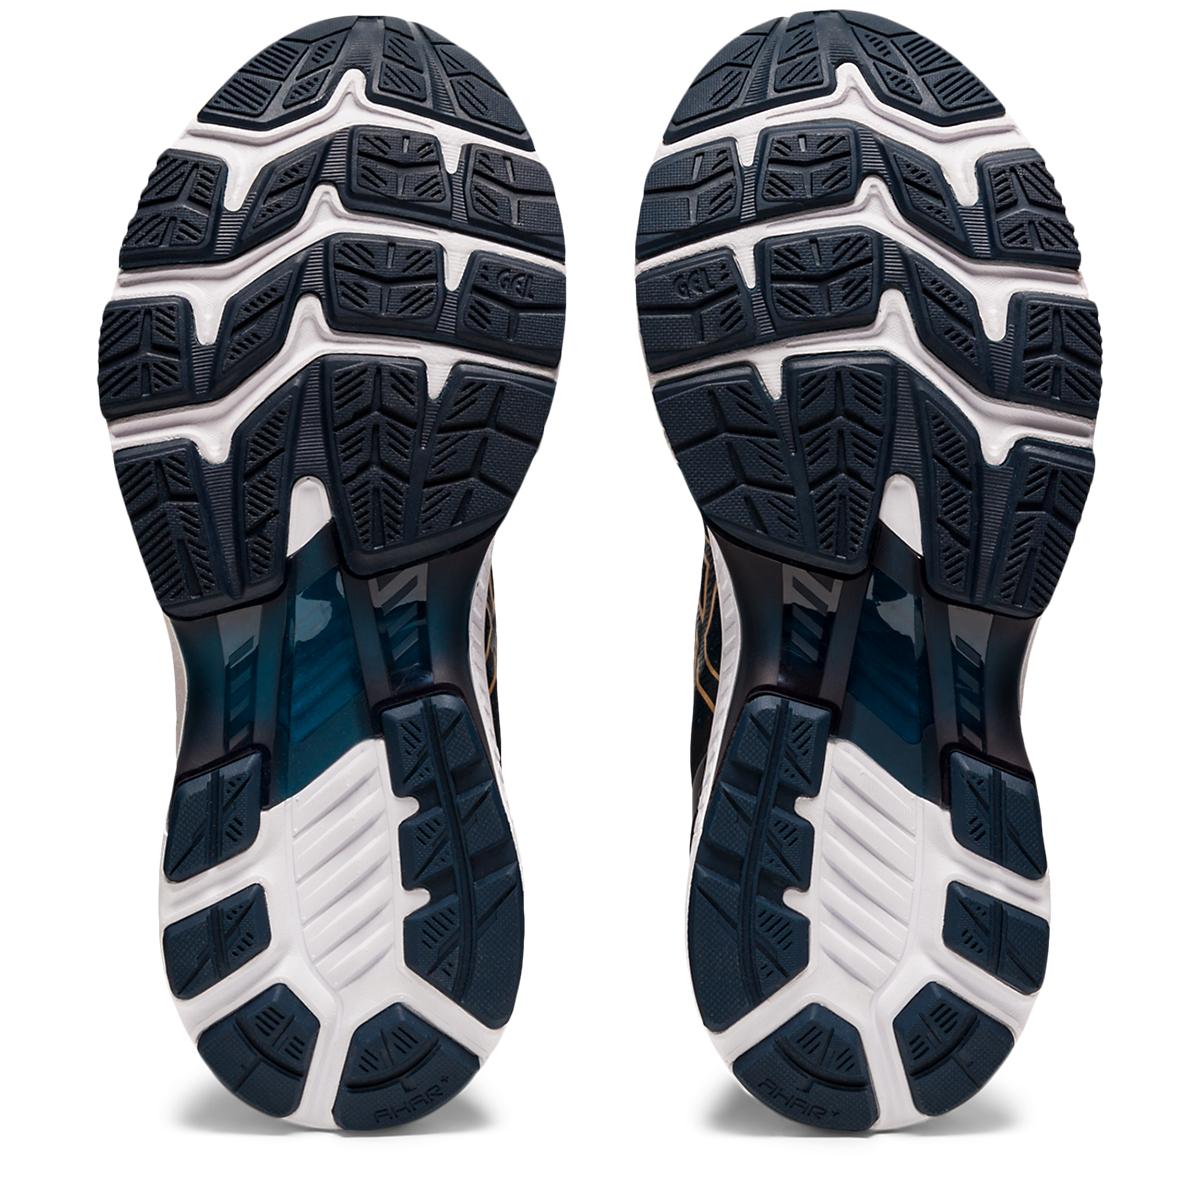 Women's Asics Gel-Kayano 27 Running Shoe - Color: French Blue/Black/Orange - Size: 5 - Width: Regular, French Blue/Black/Orange, large, image 3